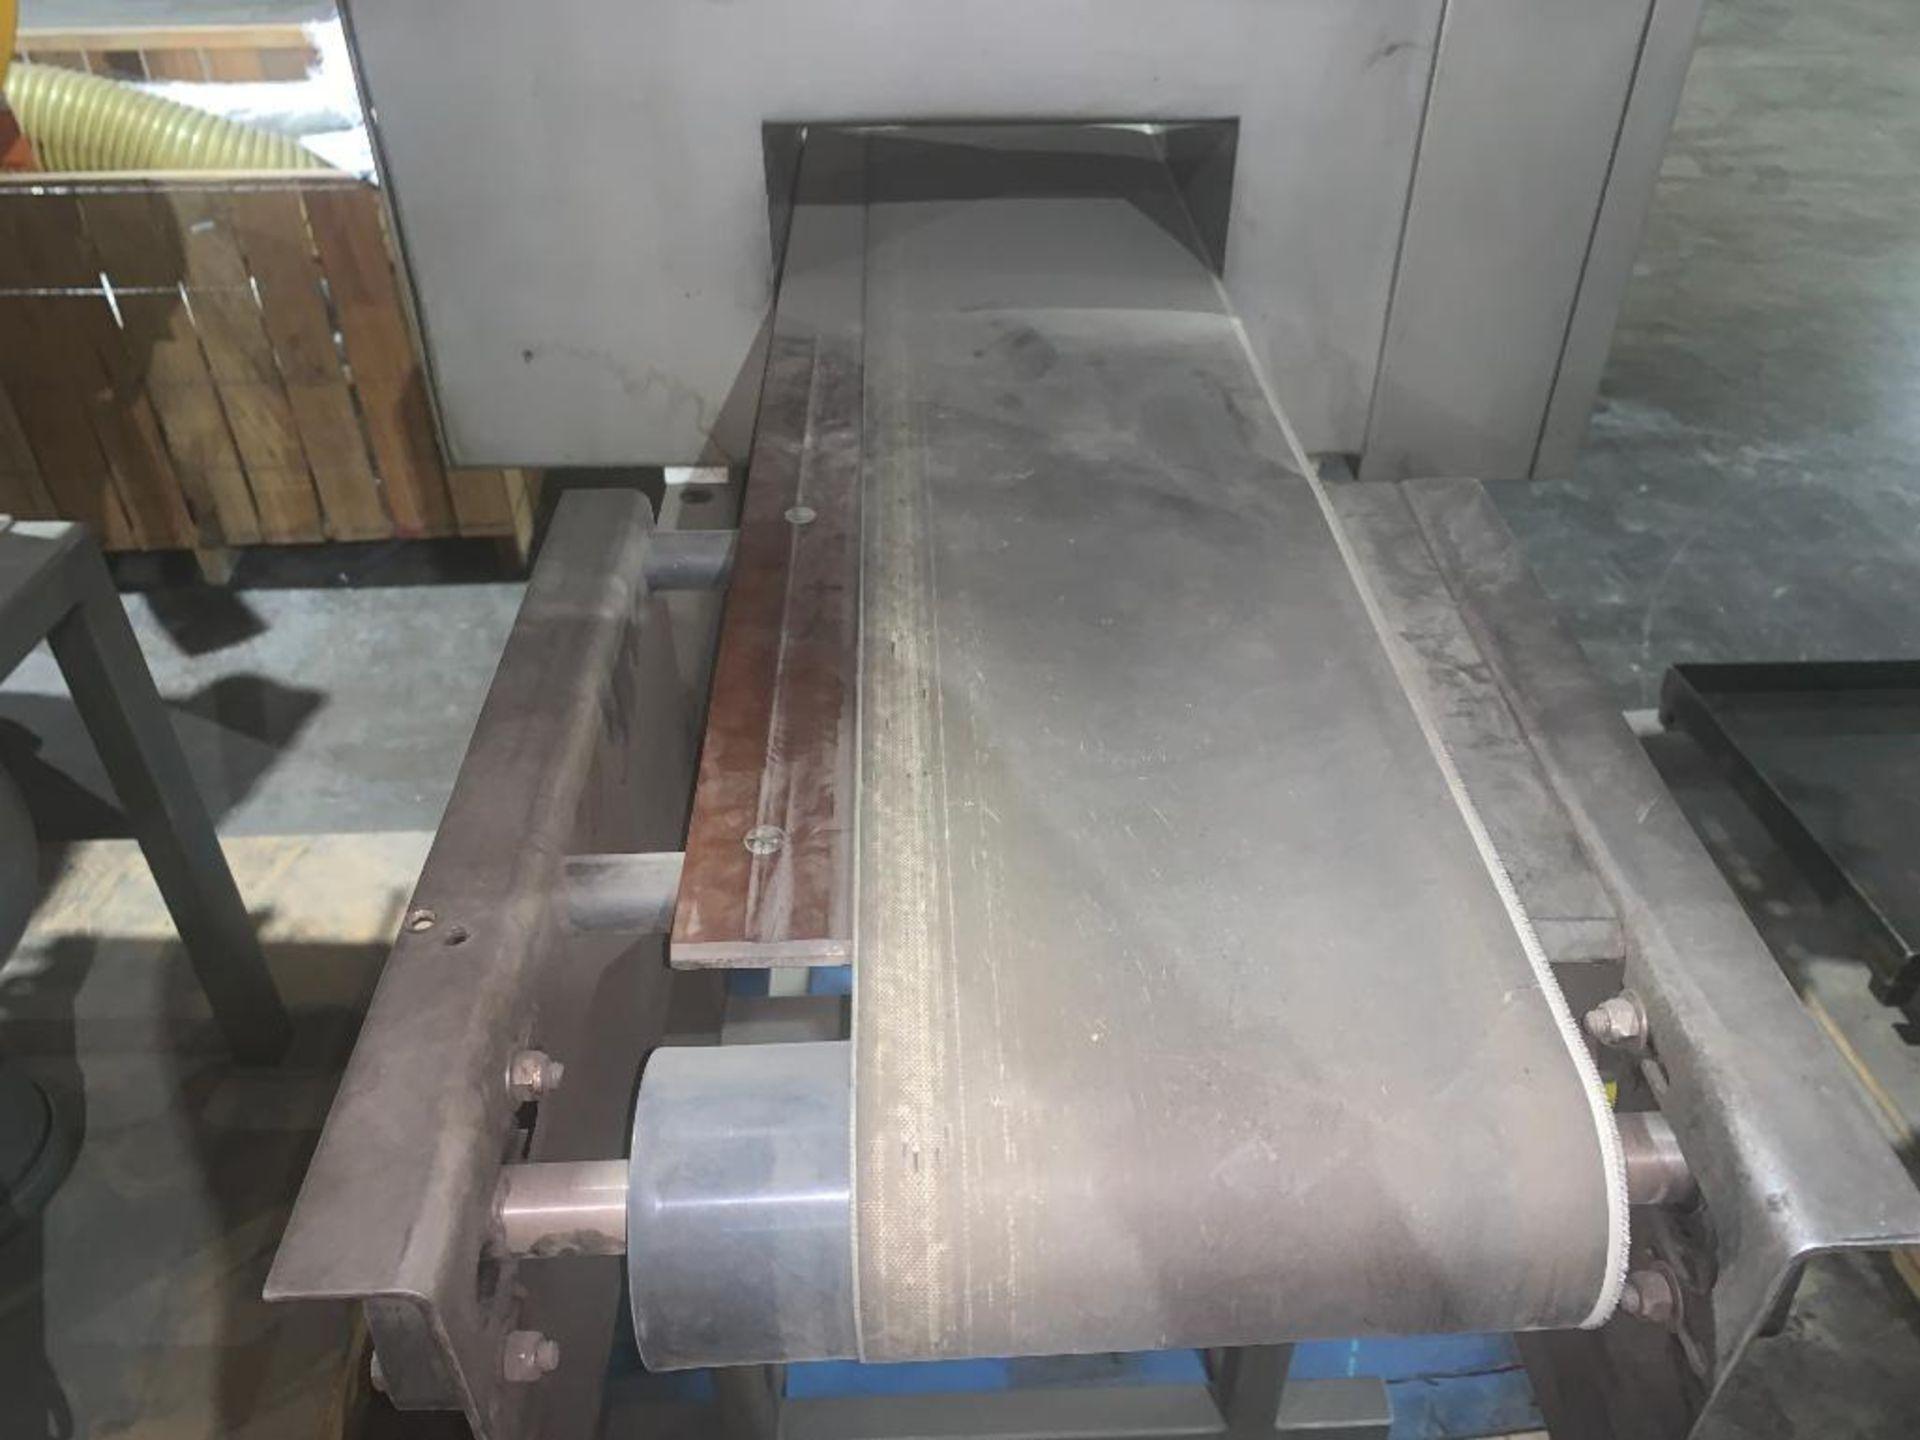 Loma metal detector - Image 4 of 10